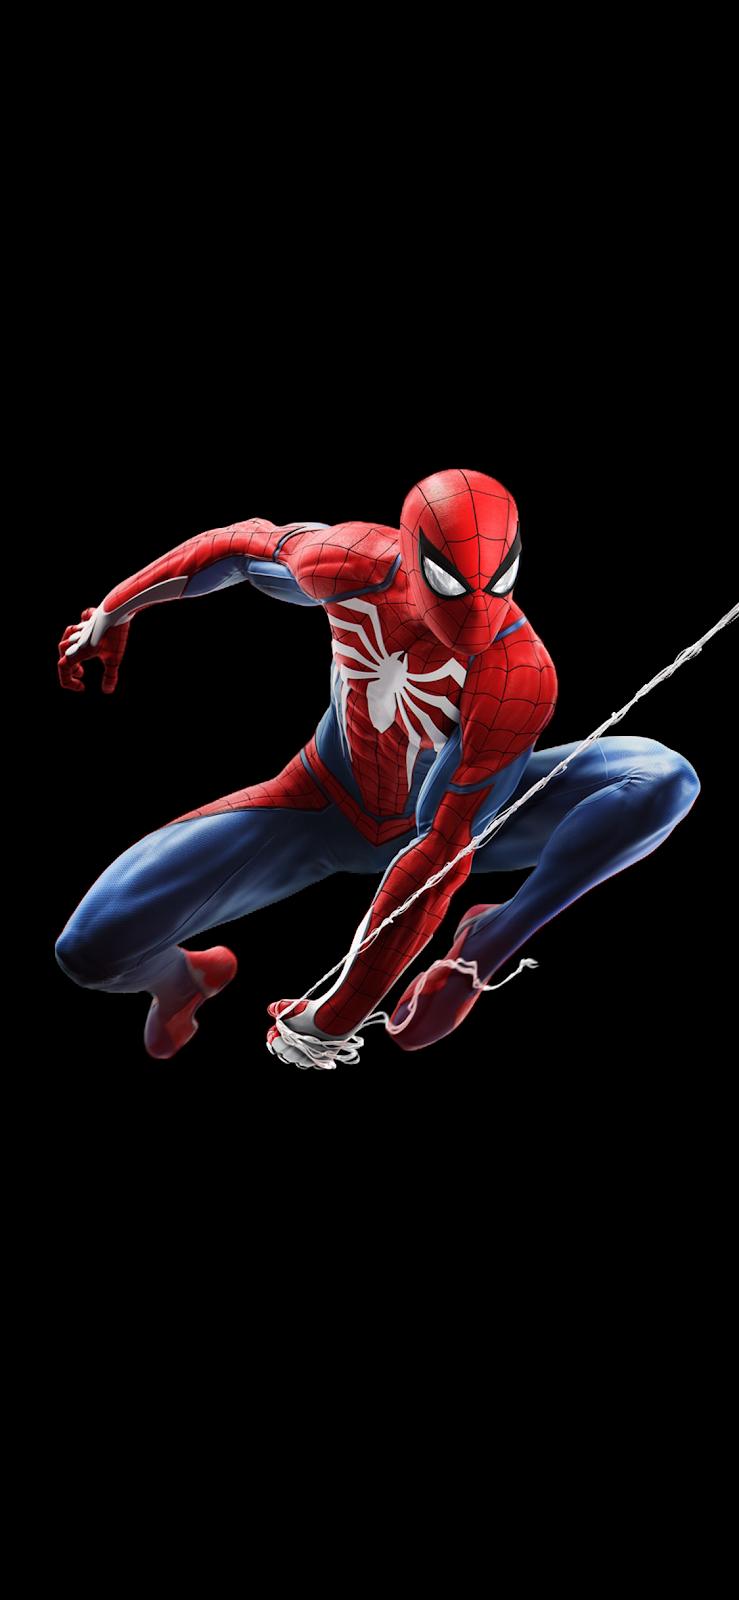 Spider Man V2 Iphone X Spider Man With Black Background